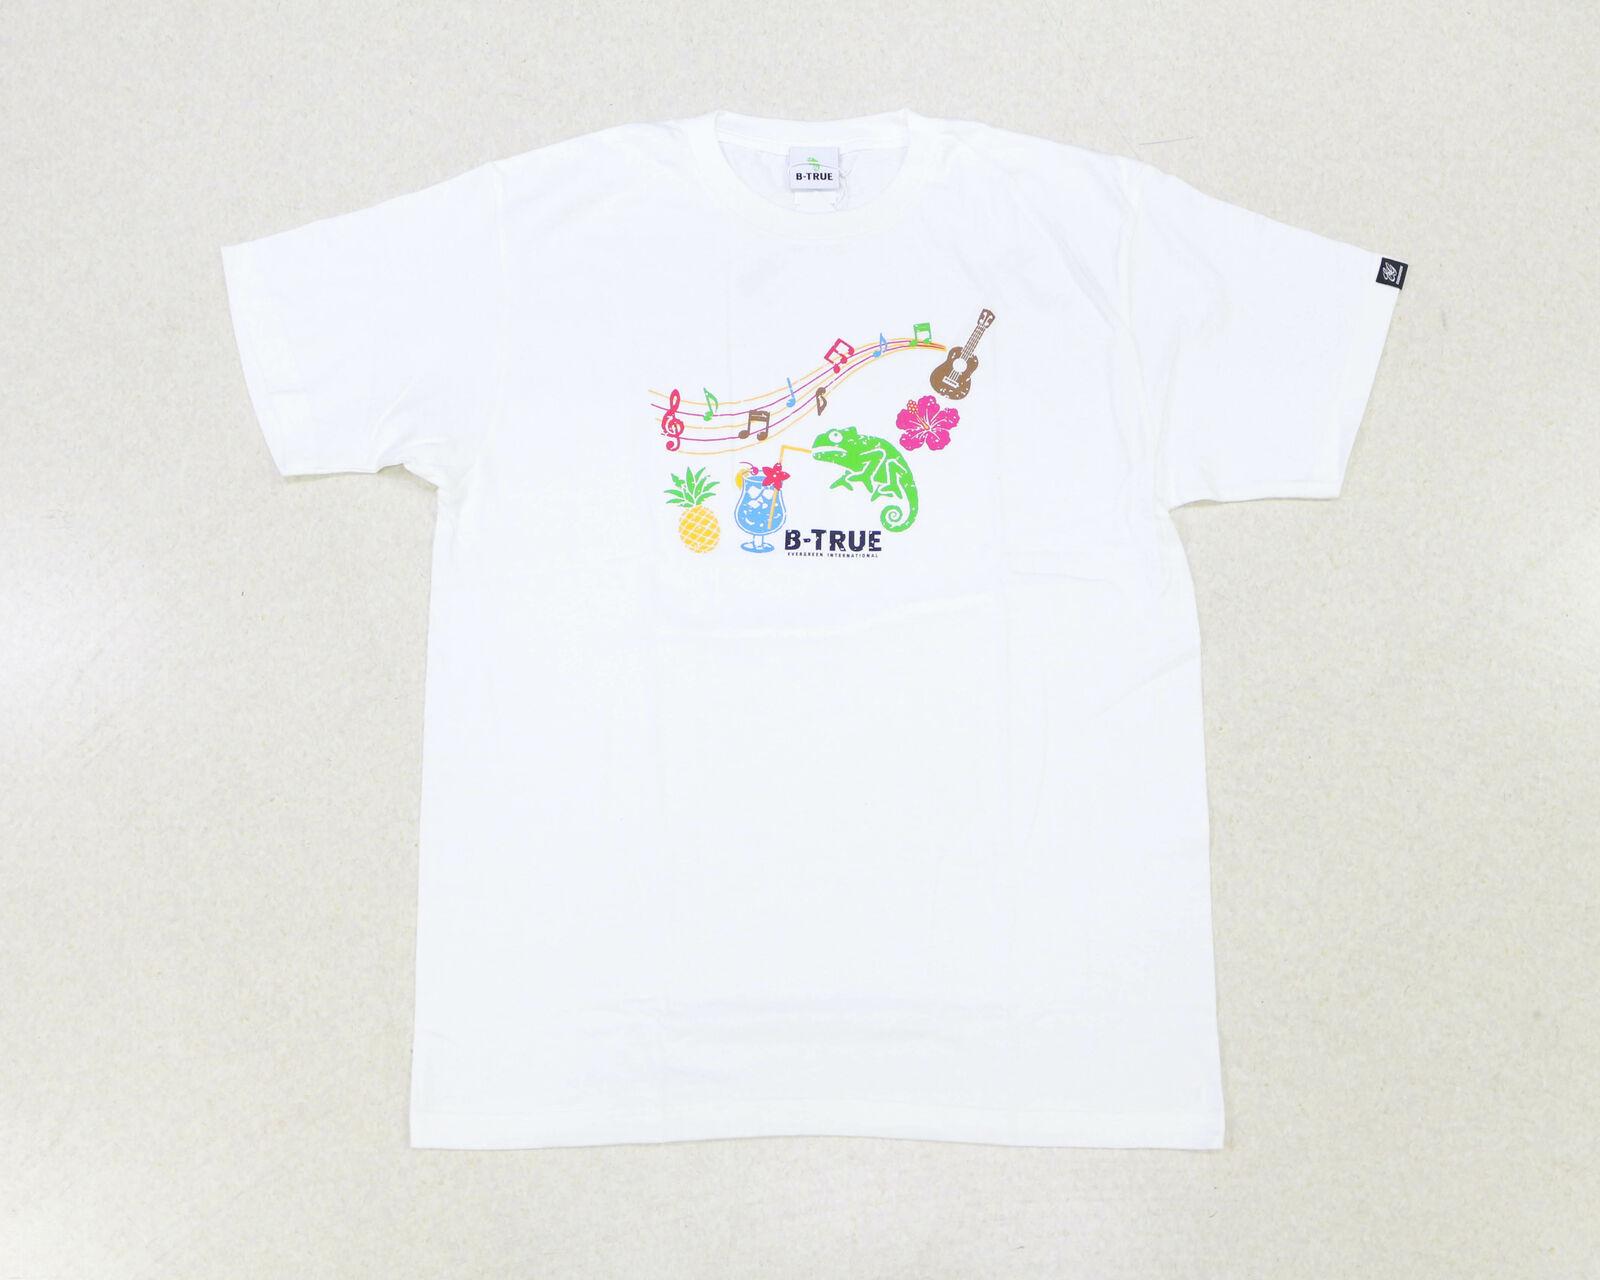 EVERverde Tshirt a uomoica corta tipo 1 Taglia M bianco 0687